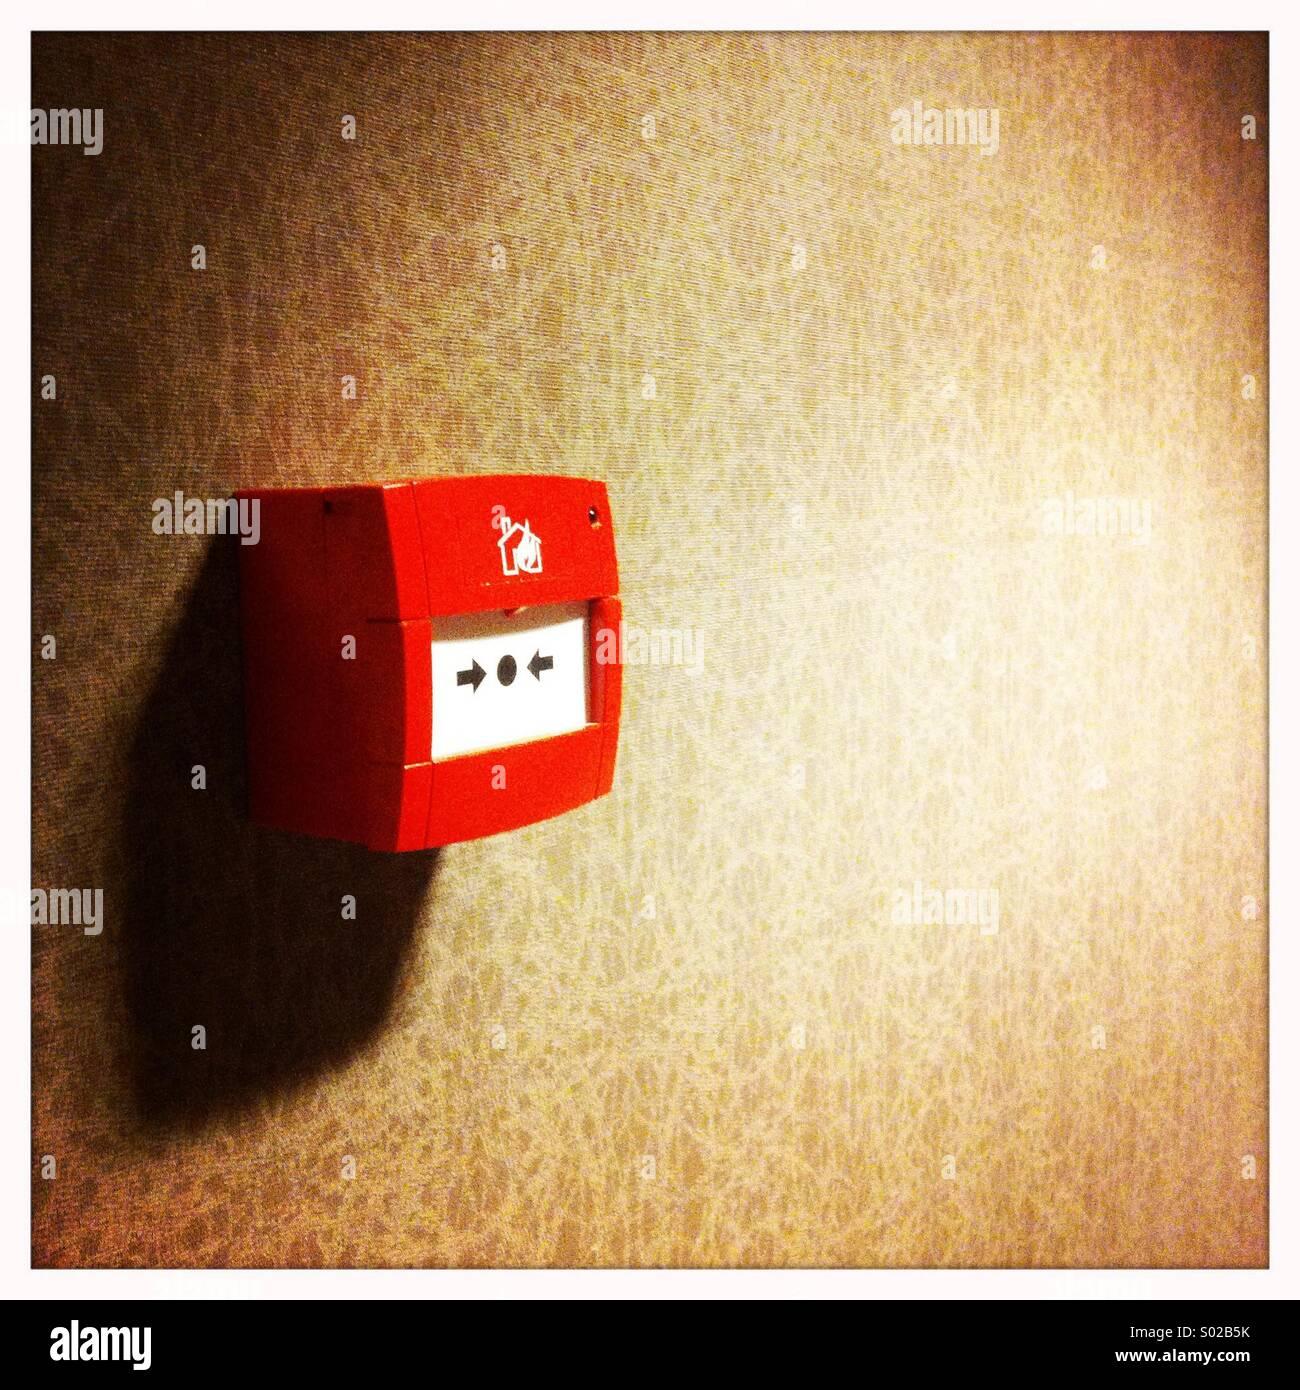 Alarme incendie Photo Stock